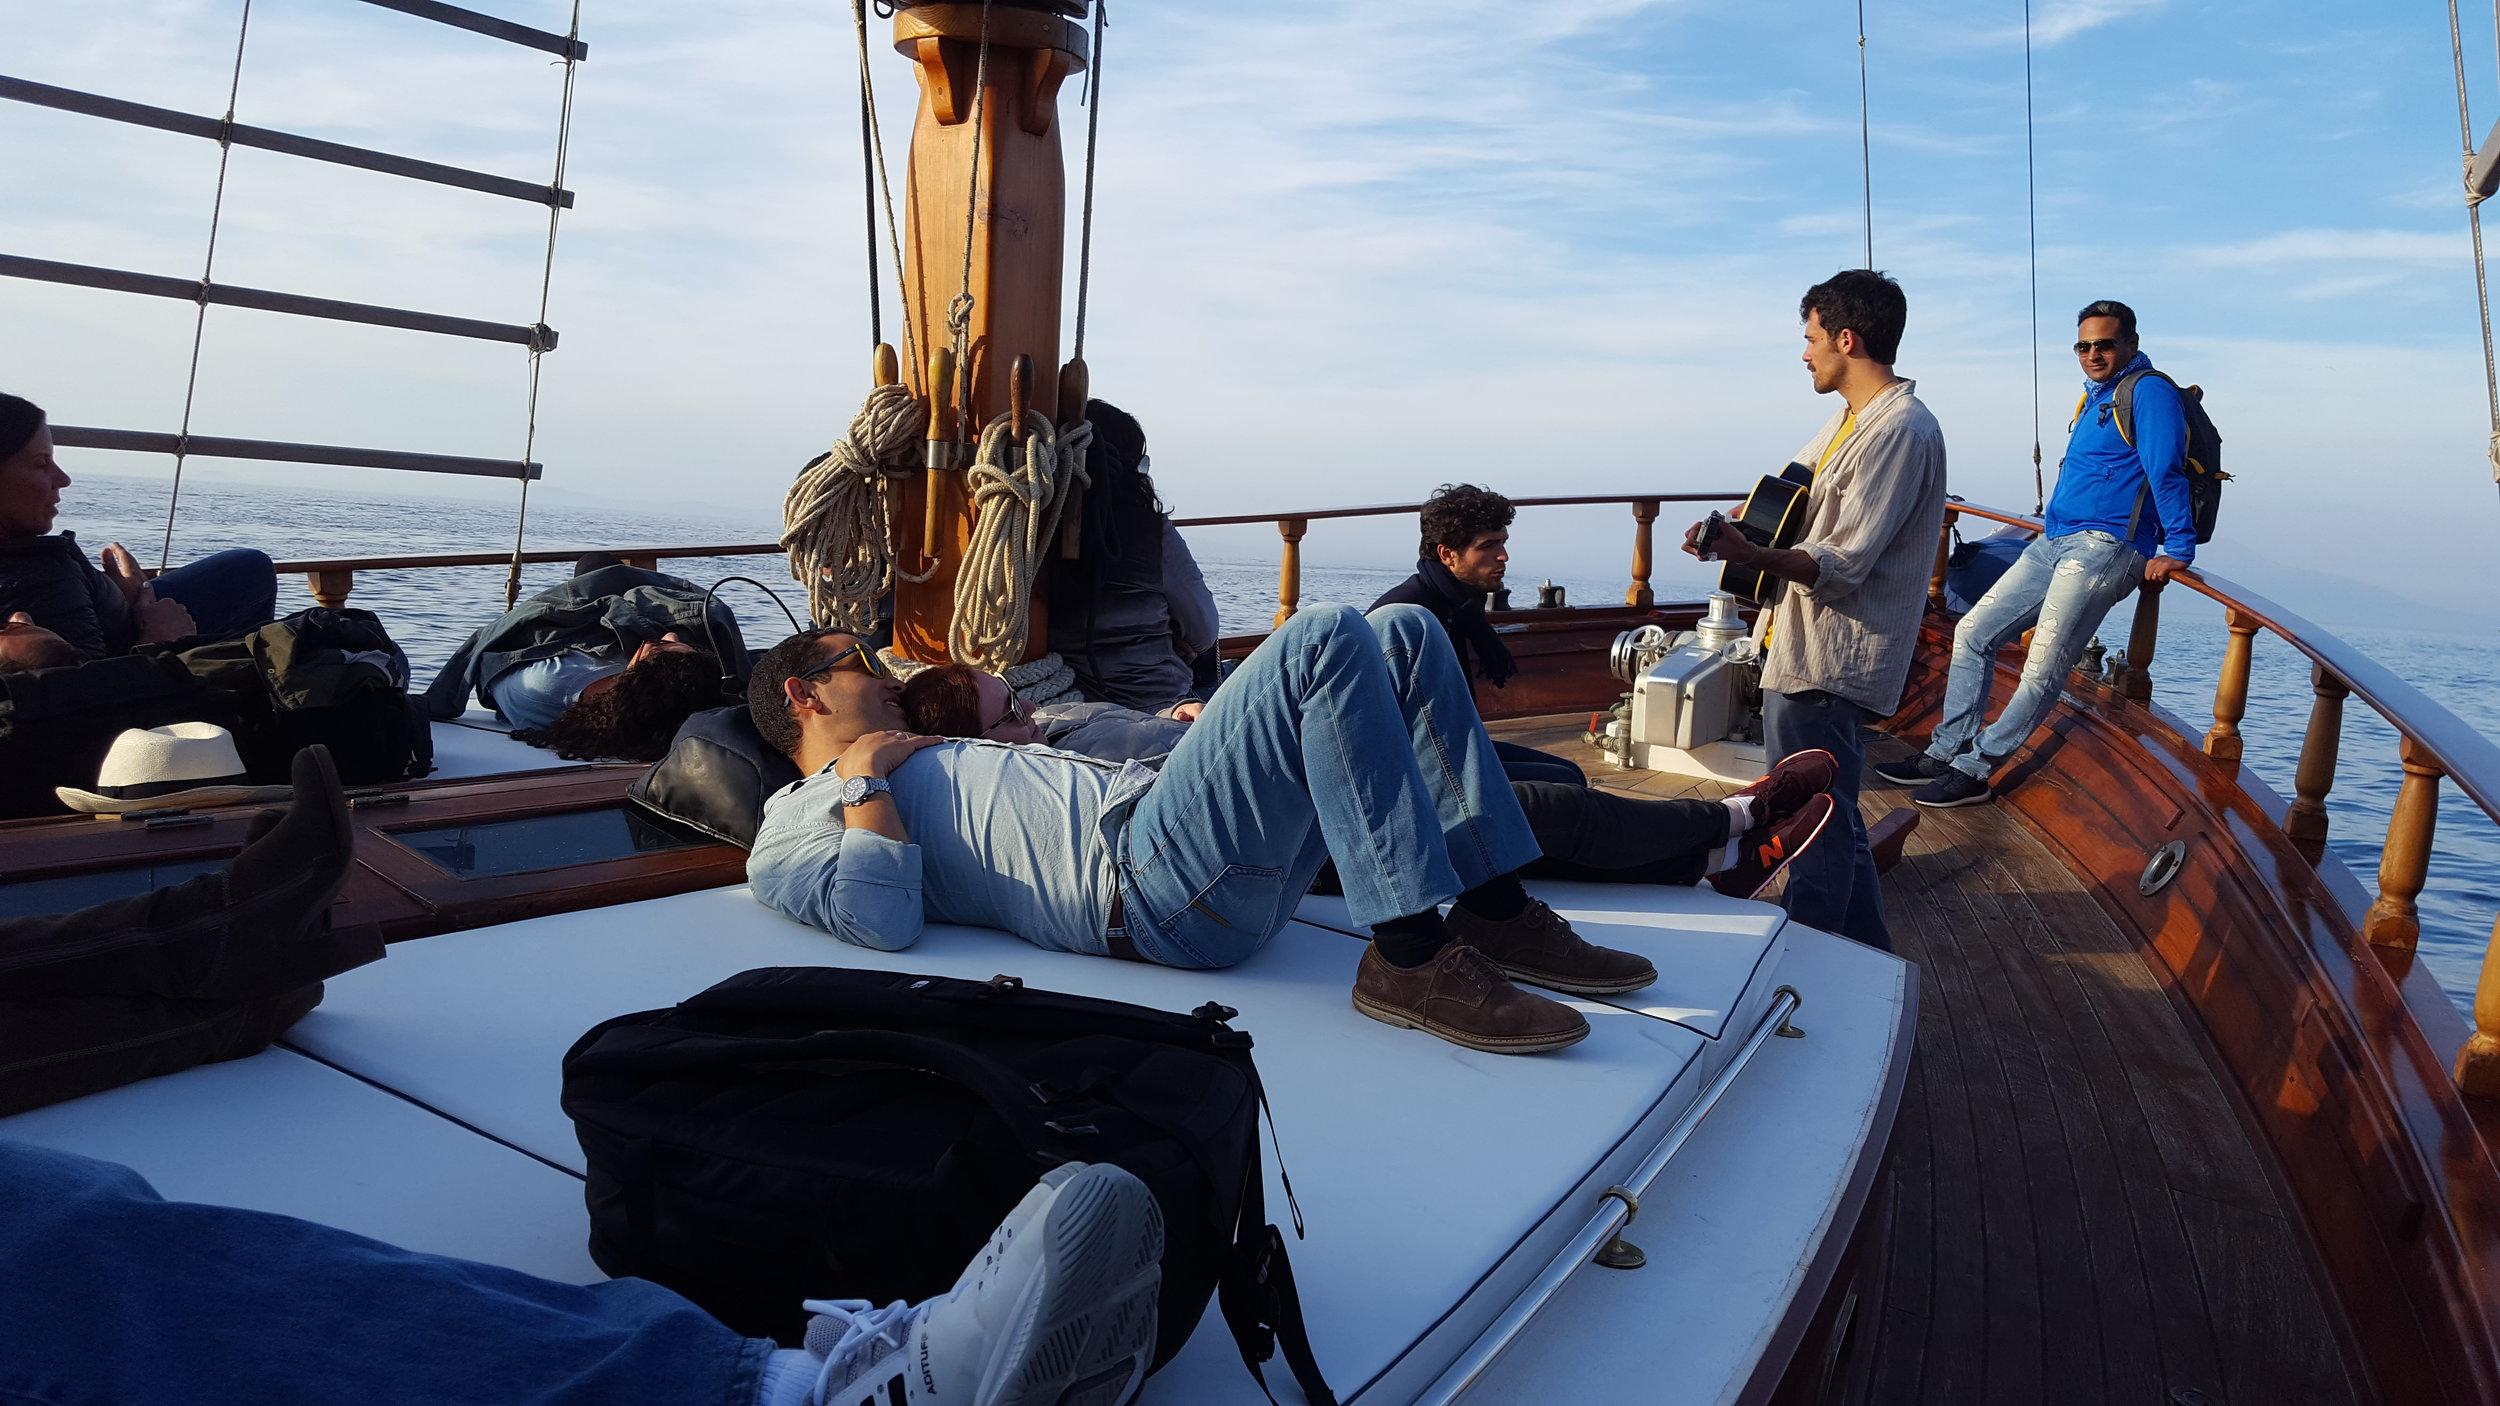 verint on boat.jpeg